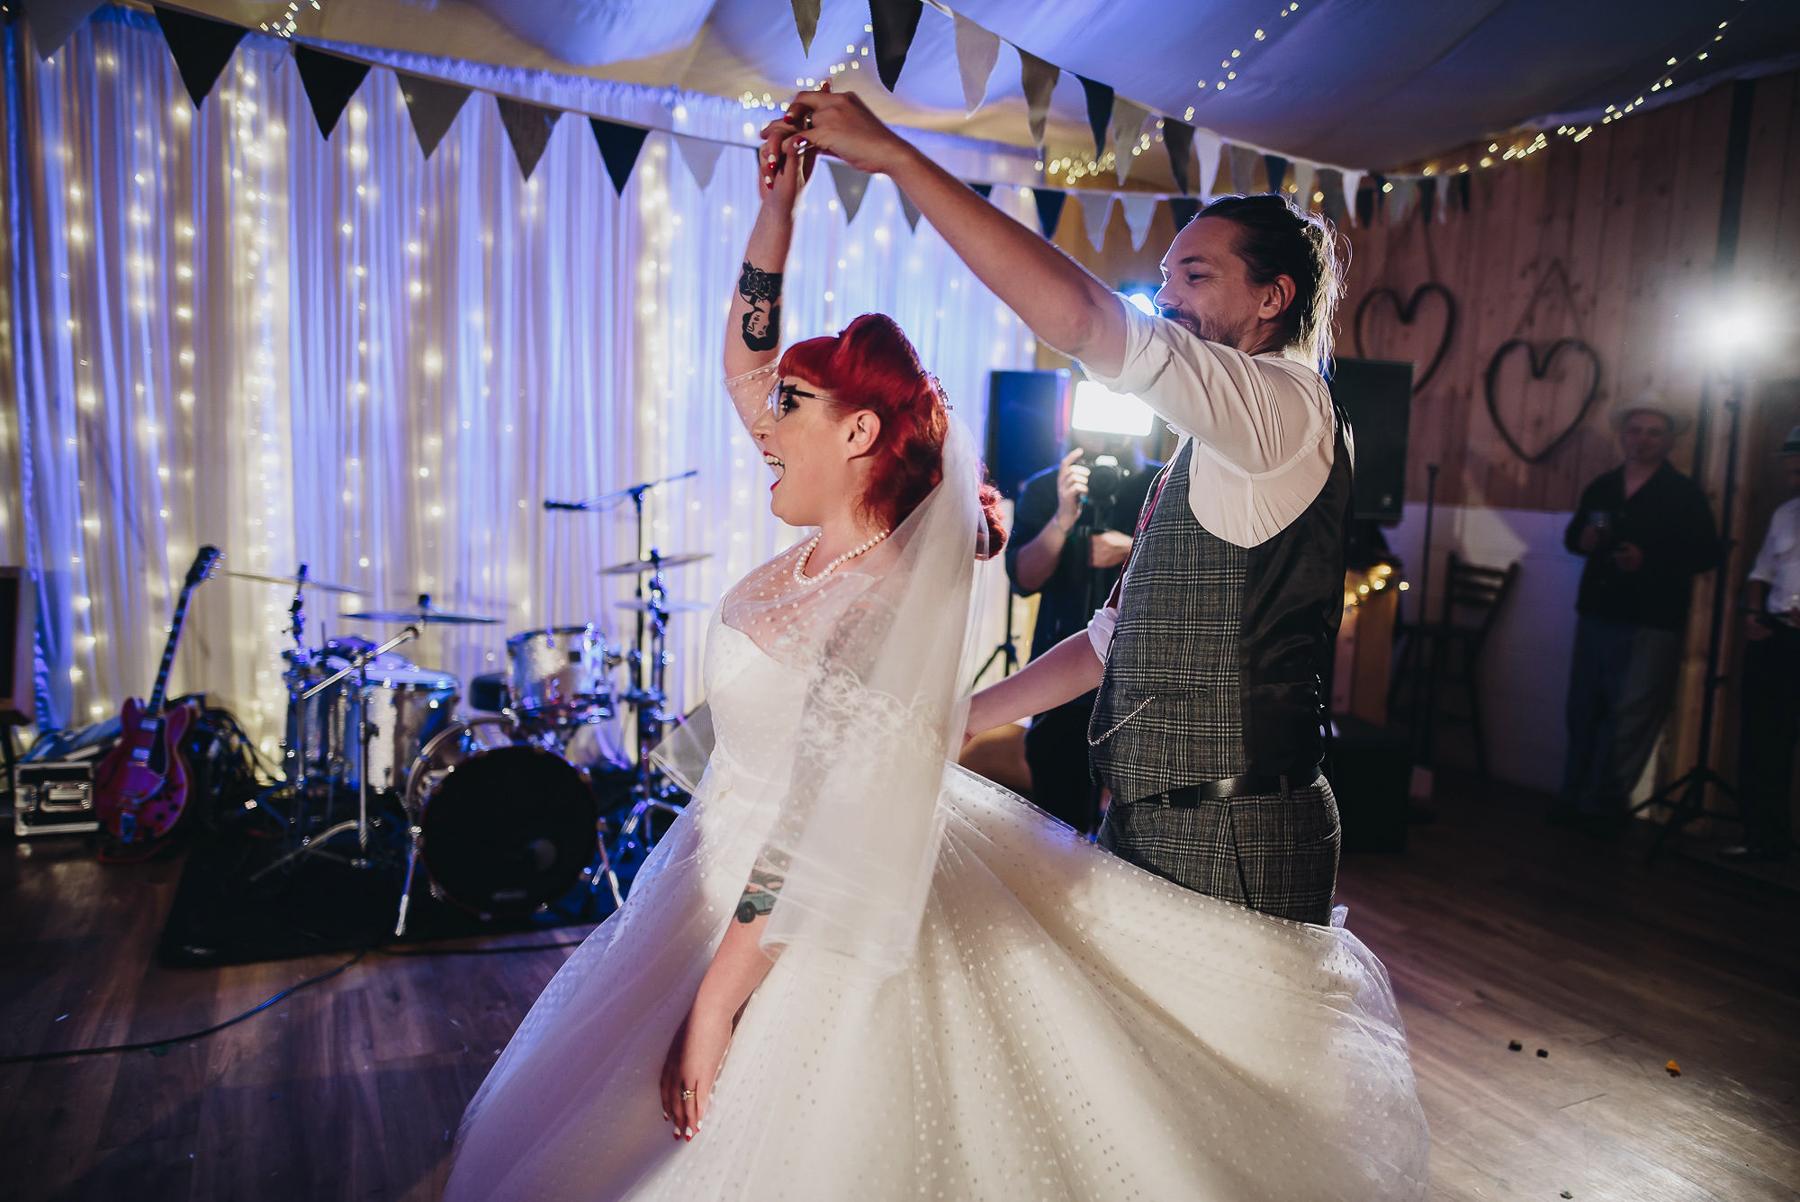 Wellbeing_Farm_Wedding_Photography_The_Pin-Up_Bride_Lara_Shaun-140.jpg